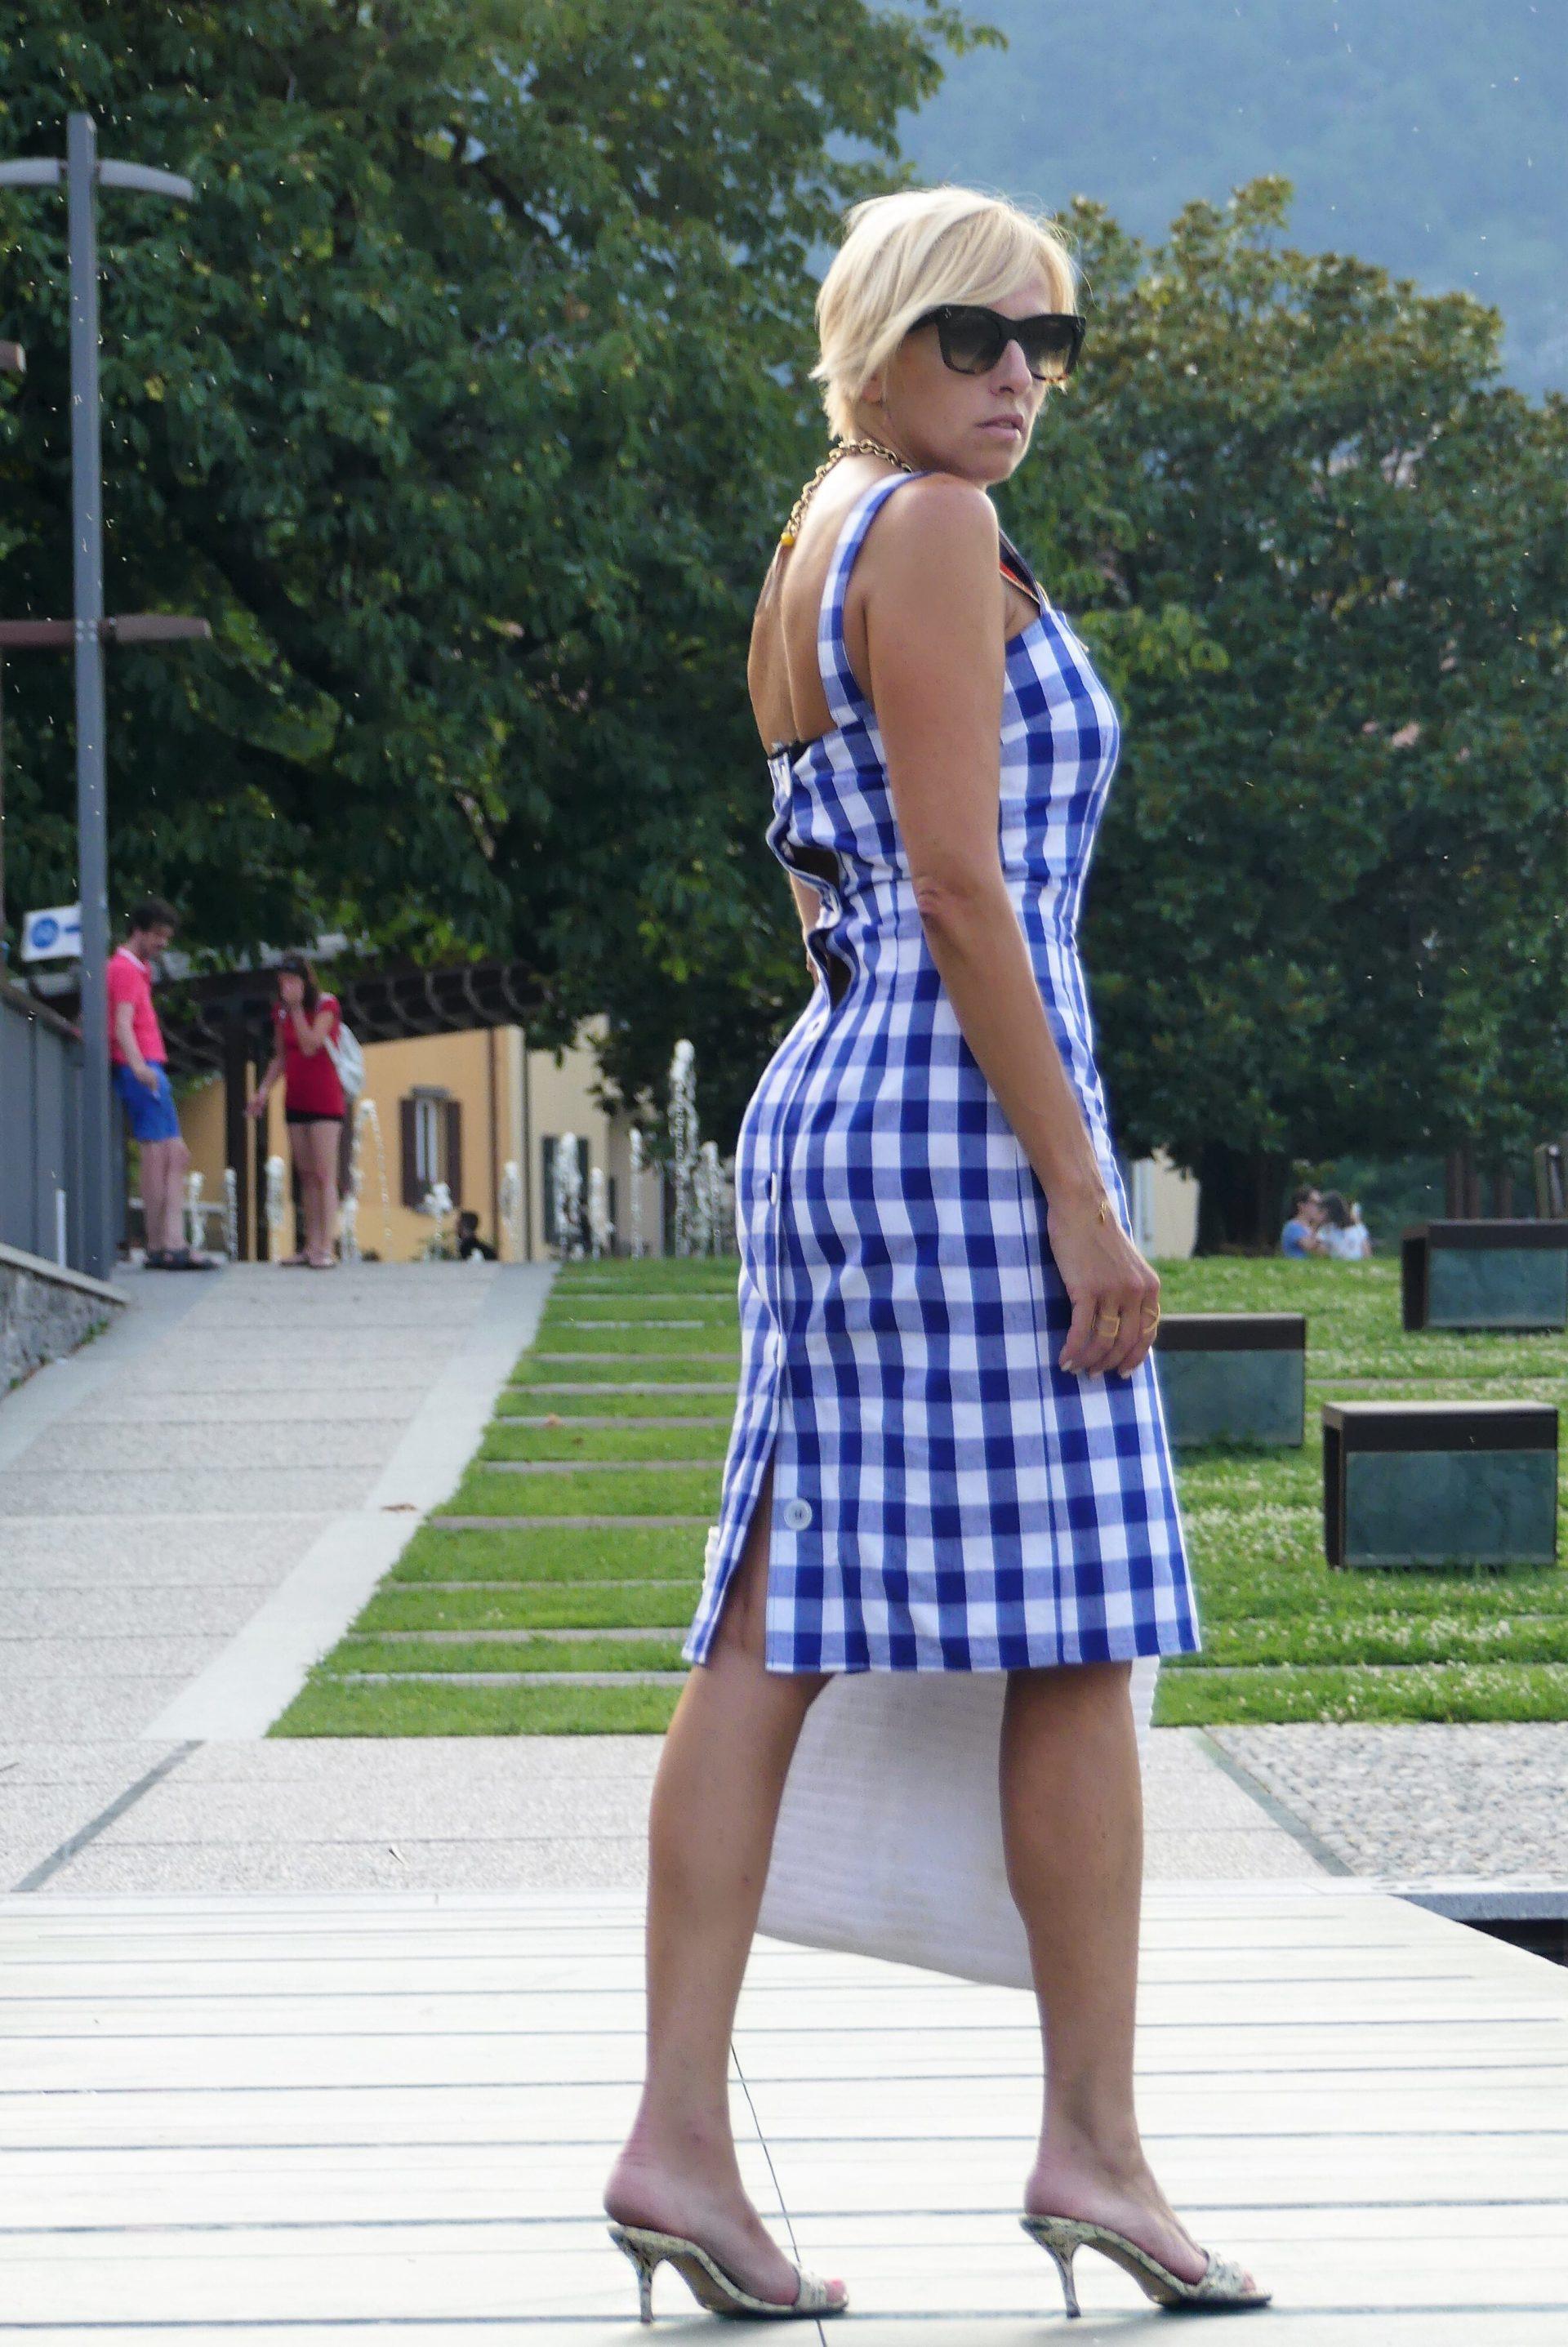 dolce gabbana dress and mukes